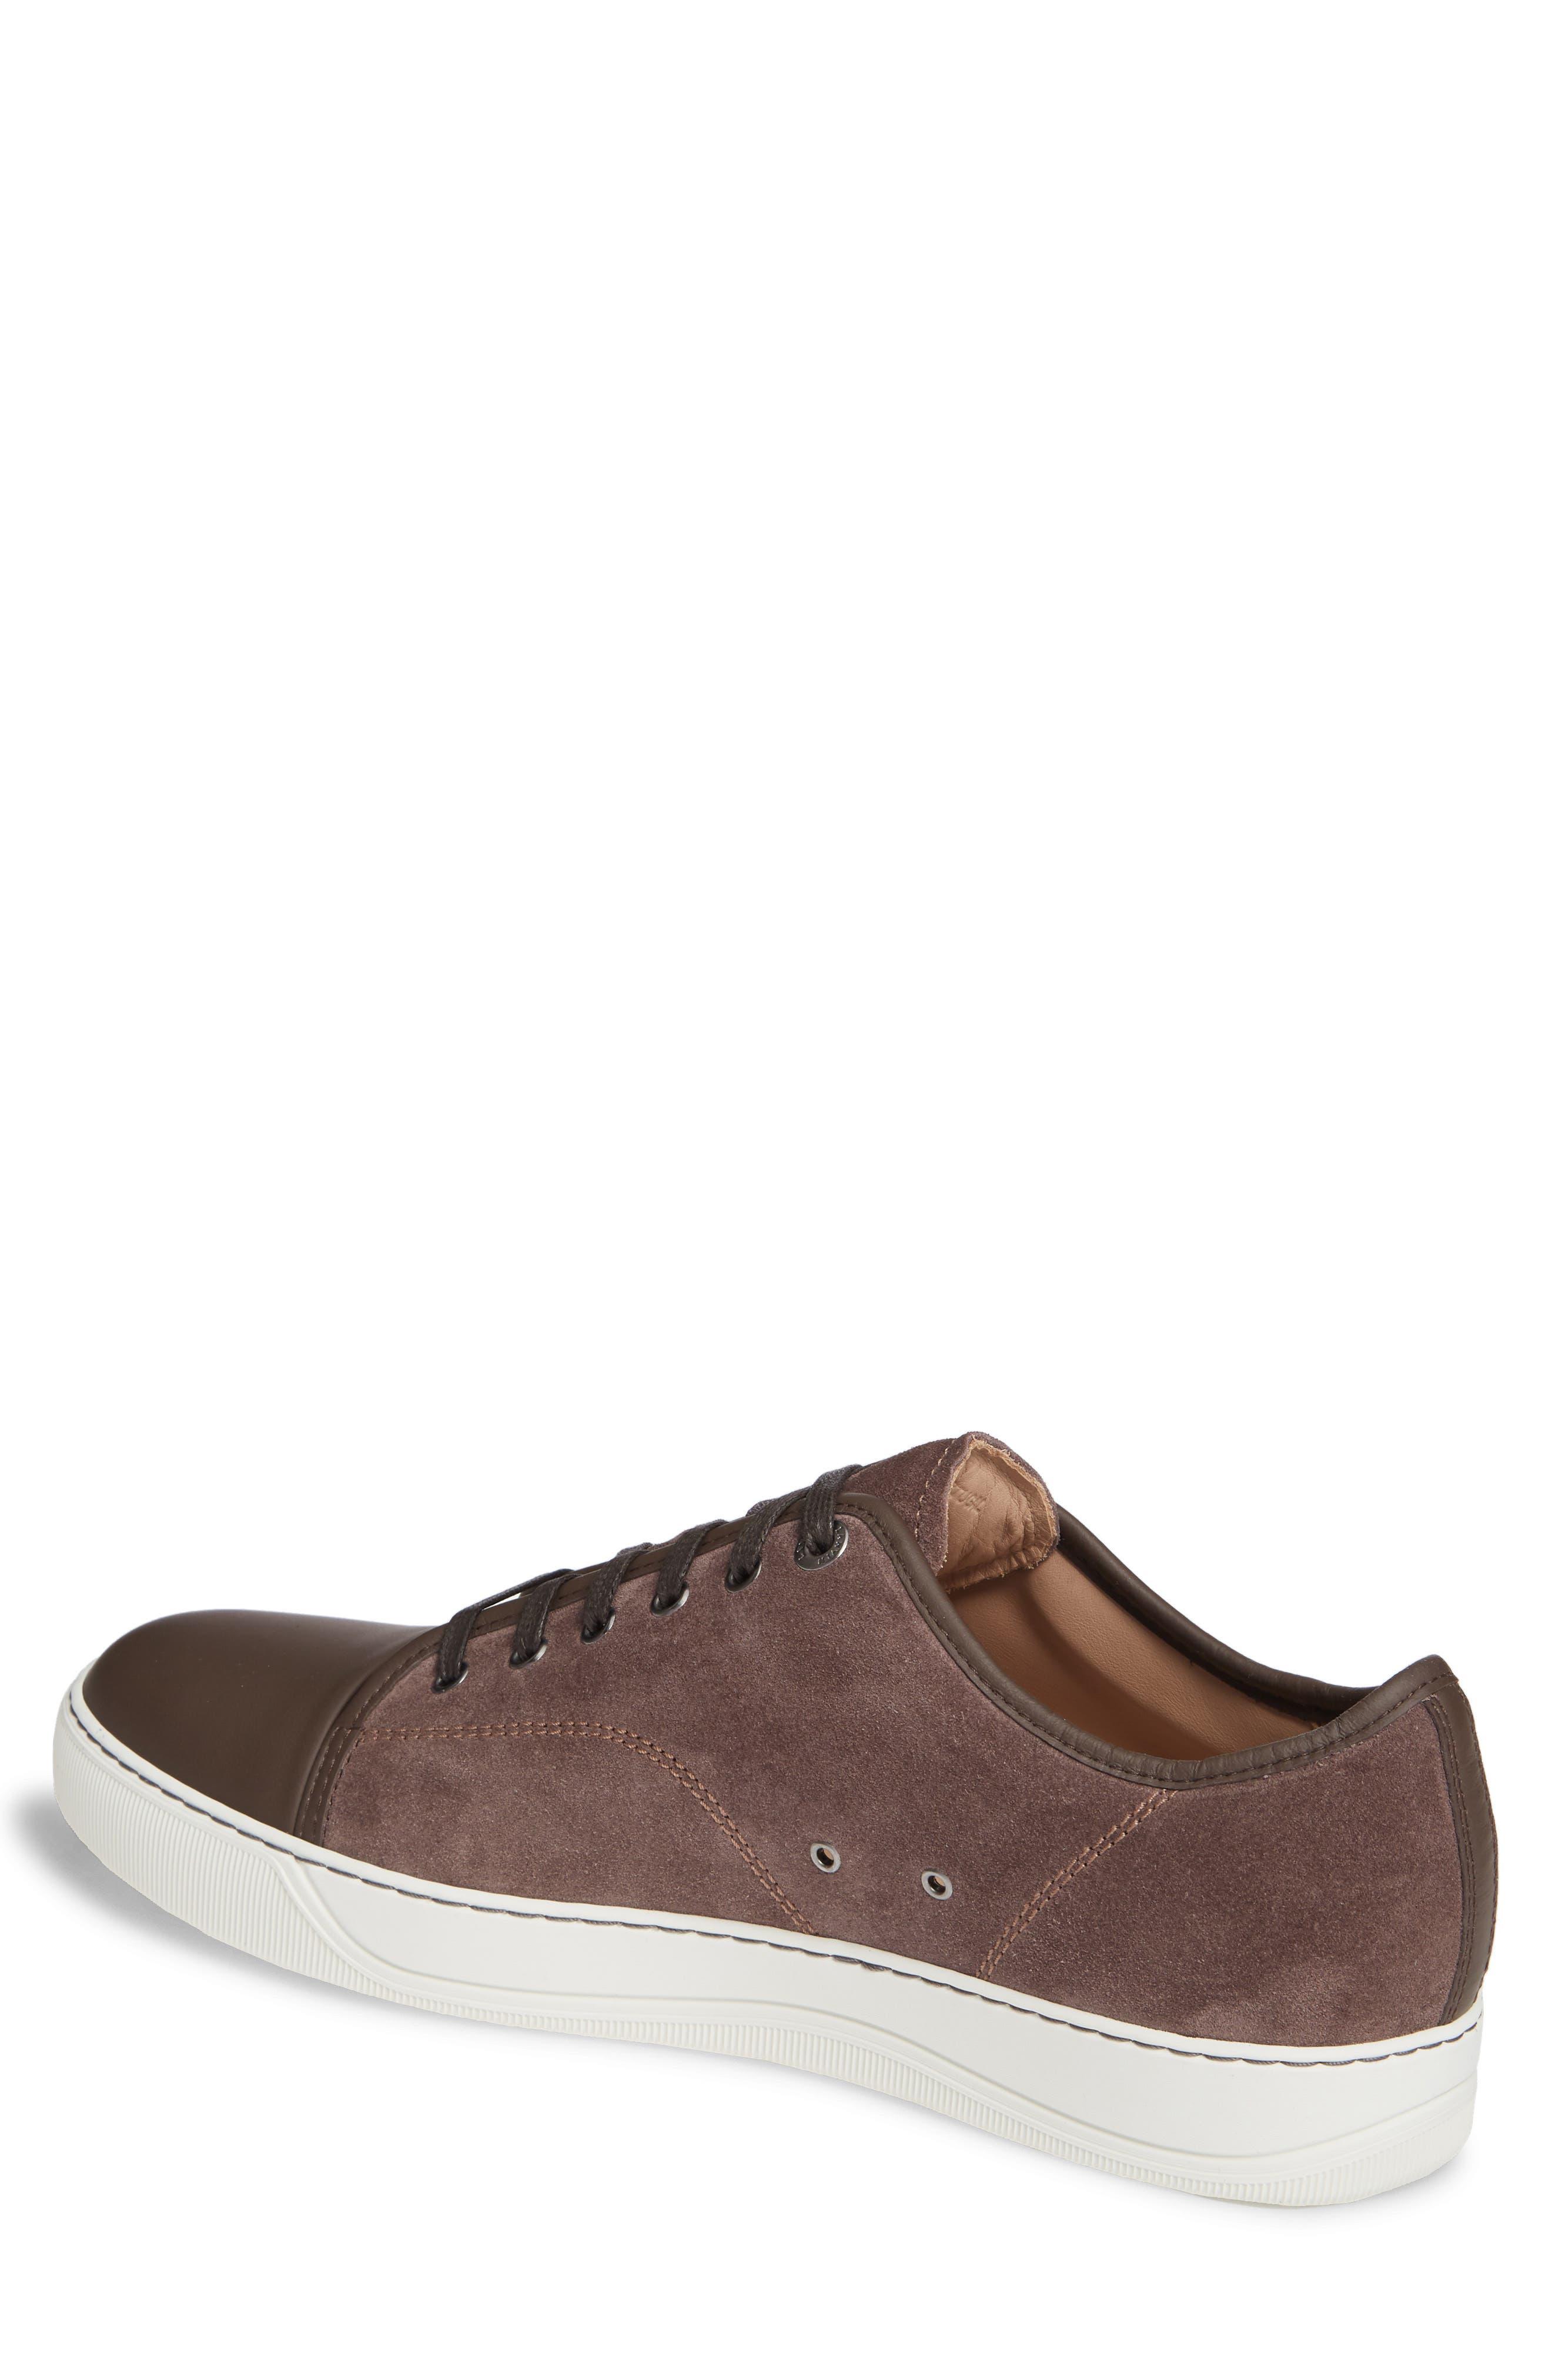 LANVIN, Low Top Sneaker, Alternate thumbnail 2, color, CLAY